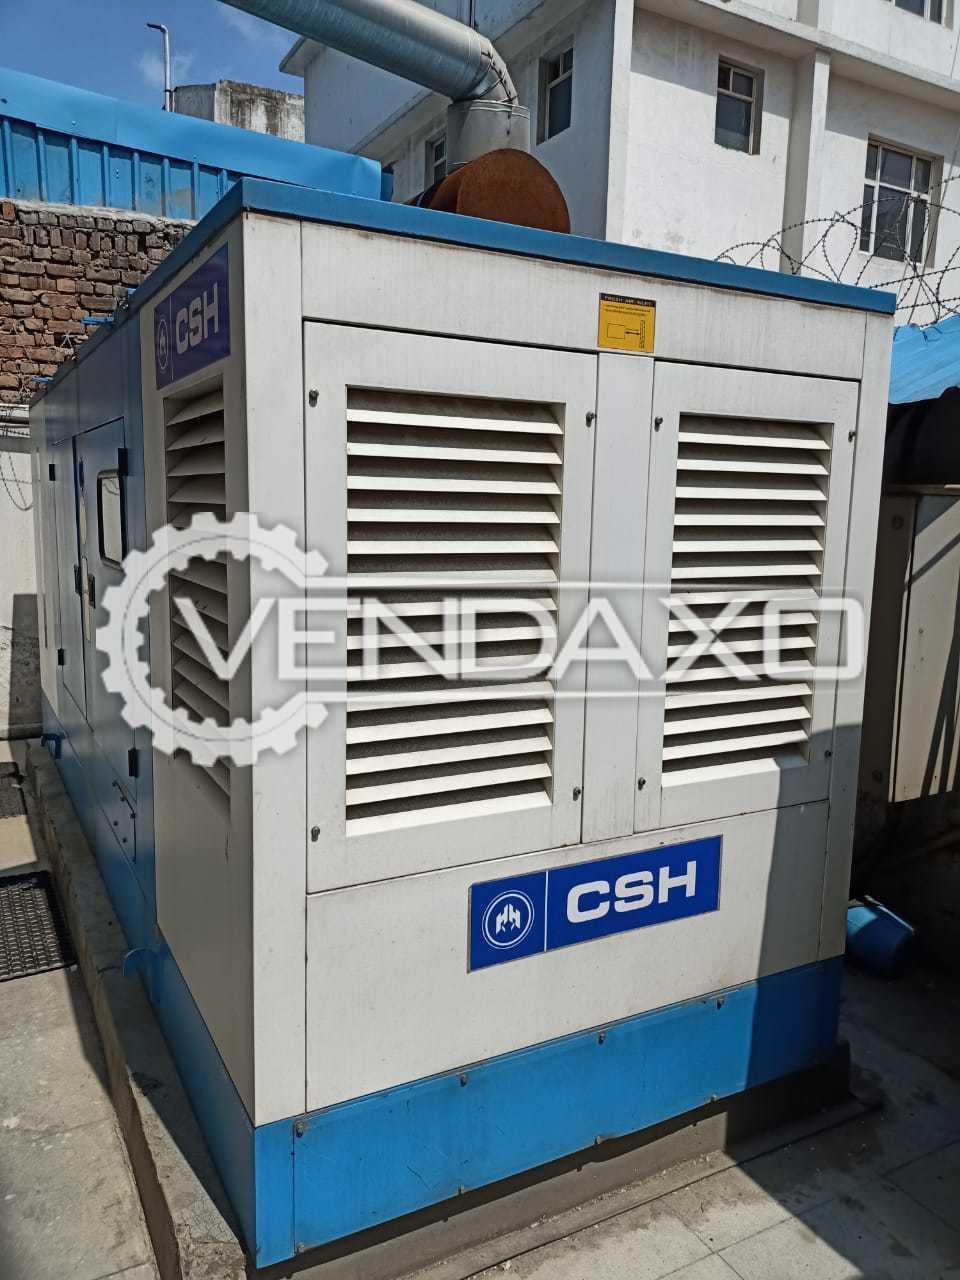 Crompton Greaves Diesel Generator - 250 Kva, 2016 Model